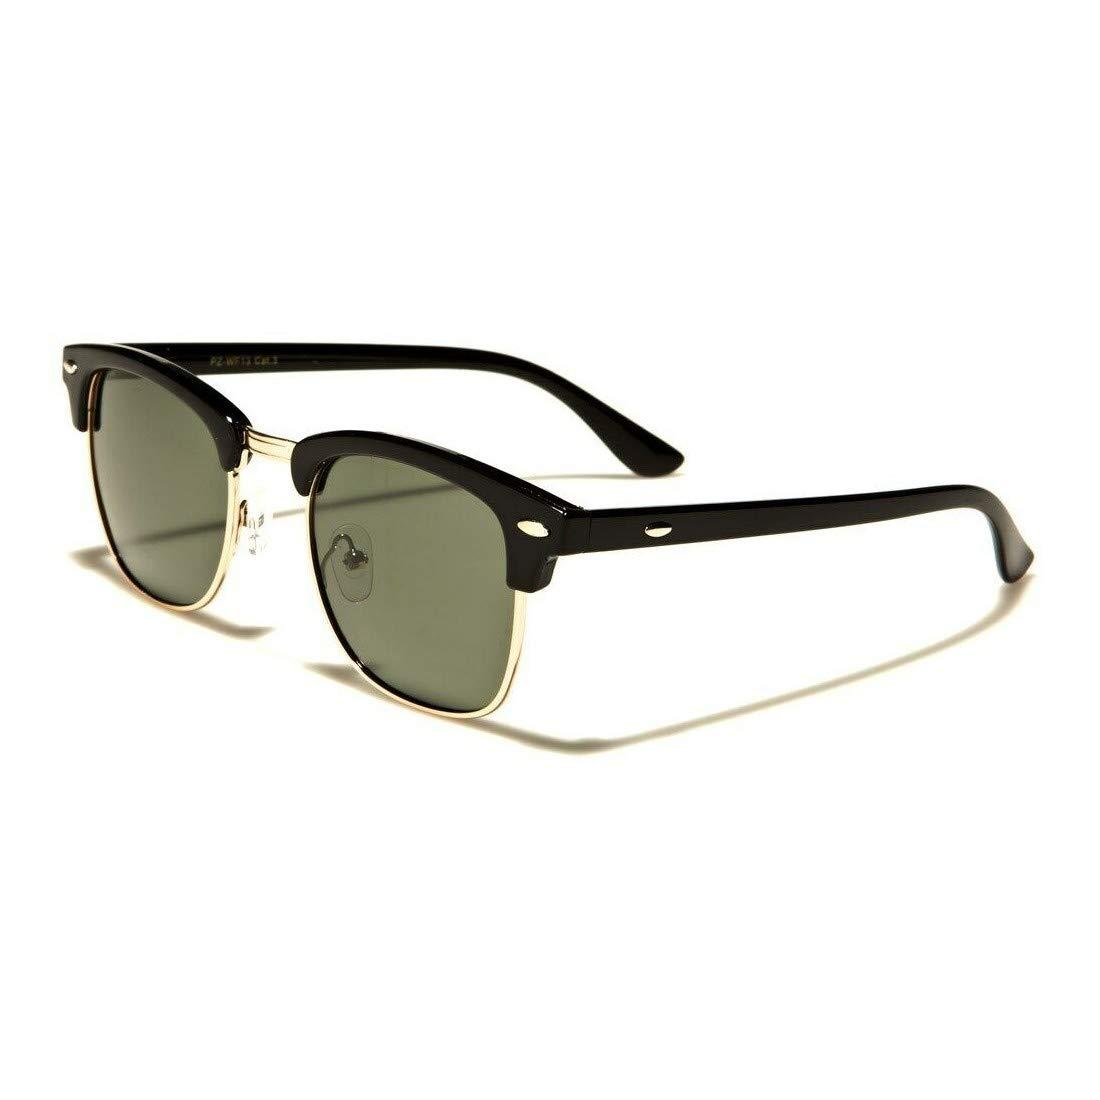 Vintage Half Frame Classic Optical Polarized Shades Women Men Sunglasses